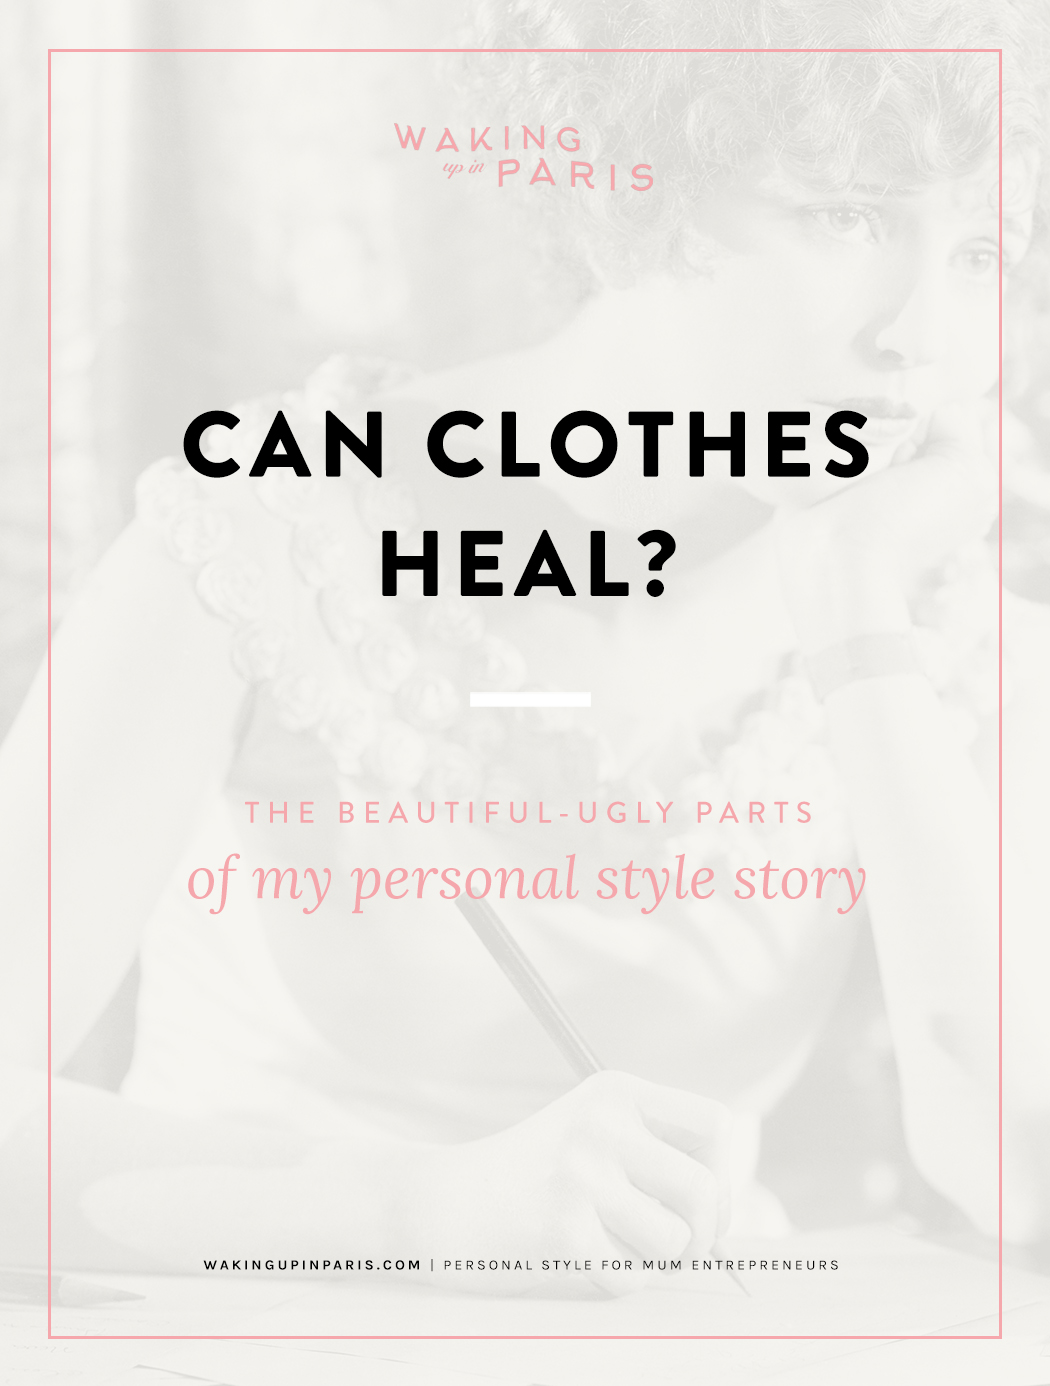 WUIP-clarissa-grace-personal-style-coach-online-mum-entrepreneur-business-can-clothes-heal.jpg